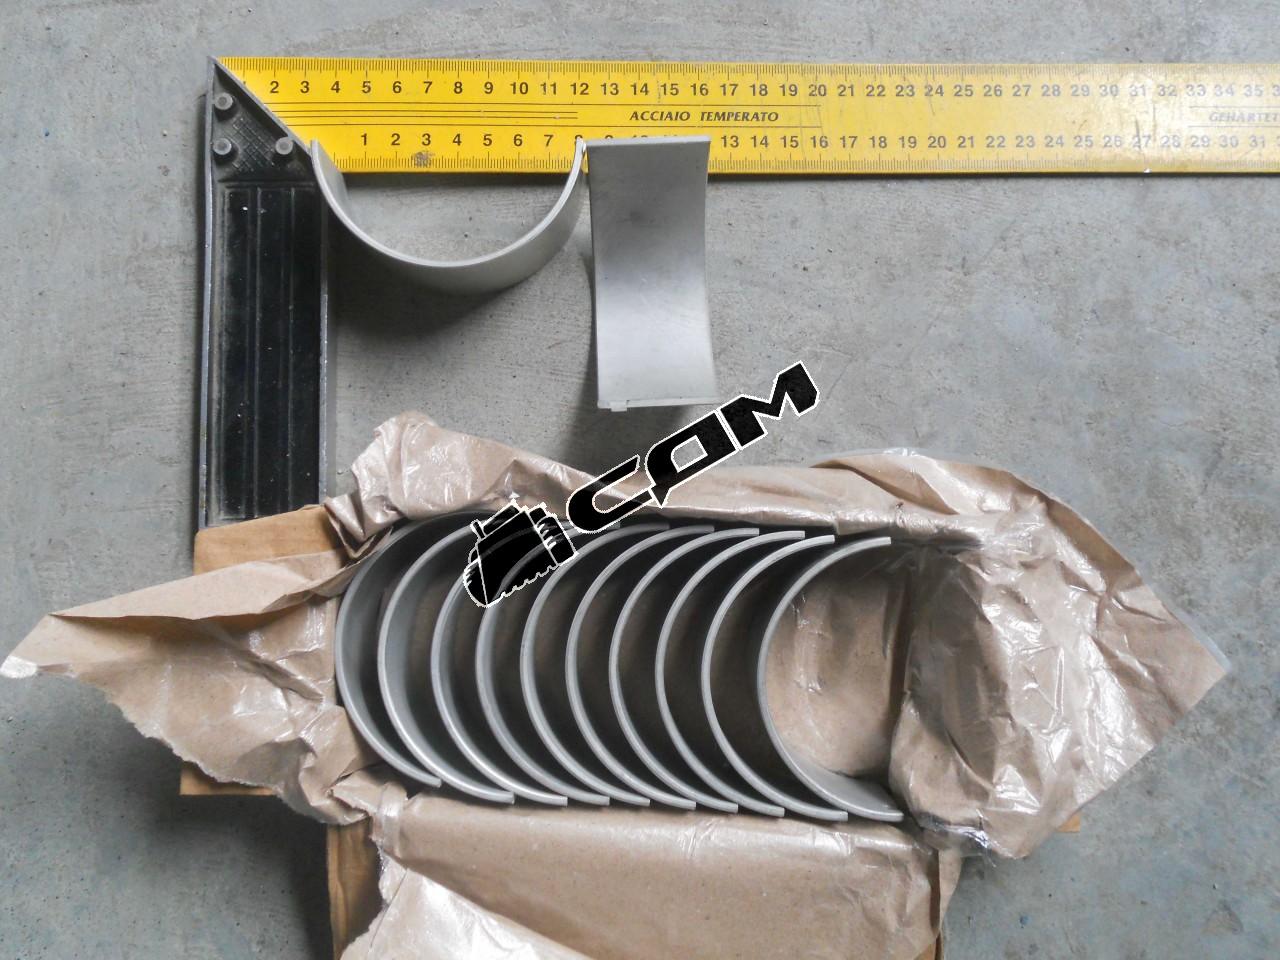 Вкладыш шатунный (комплект) CDM520/1185  D05-113-30